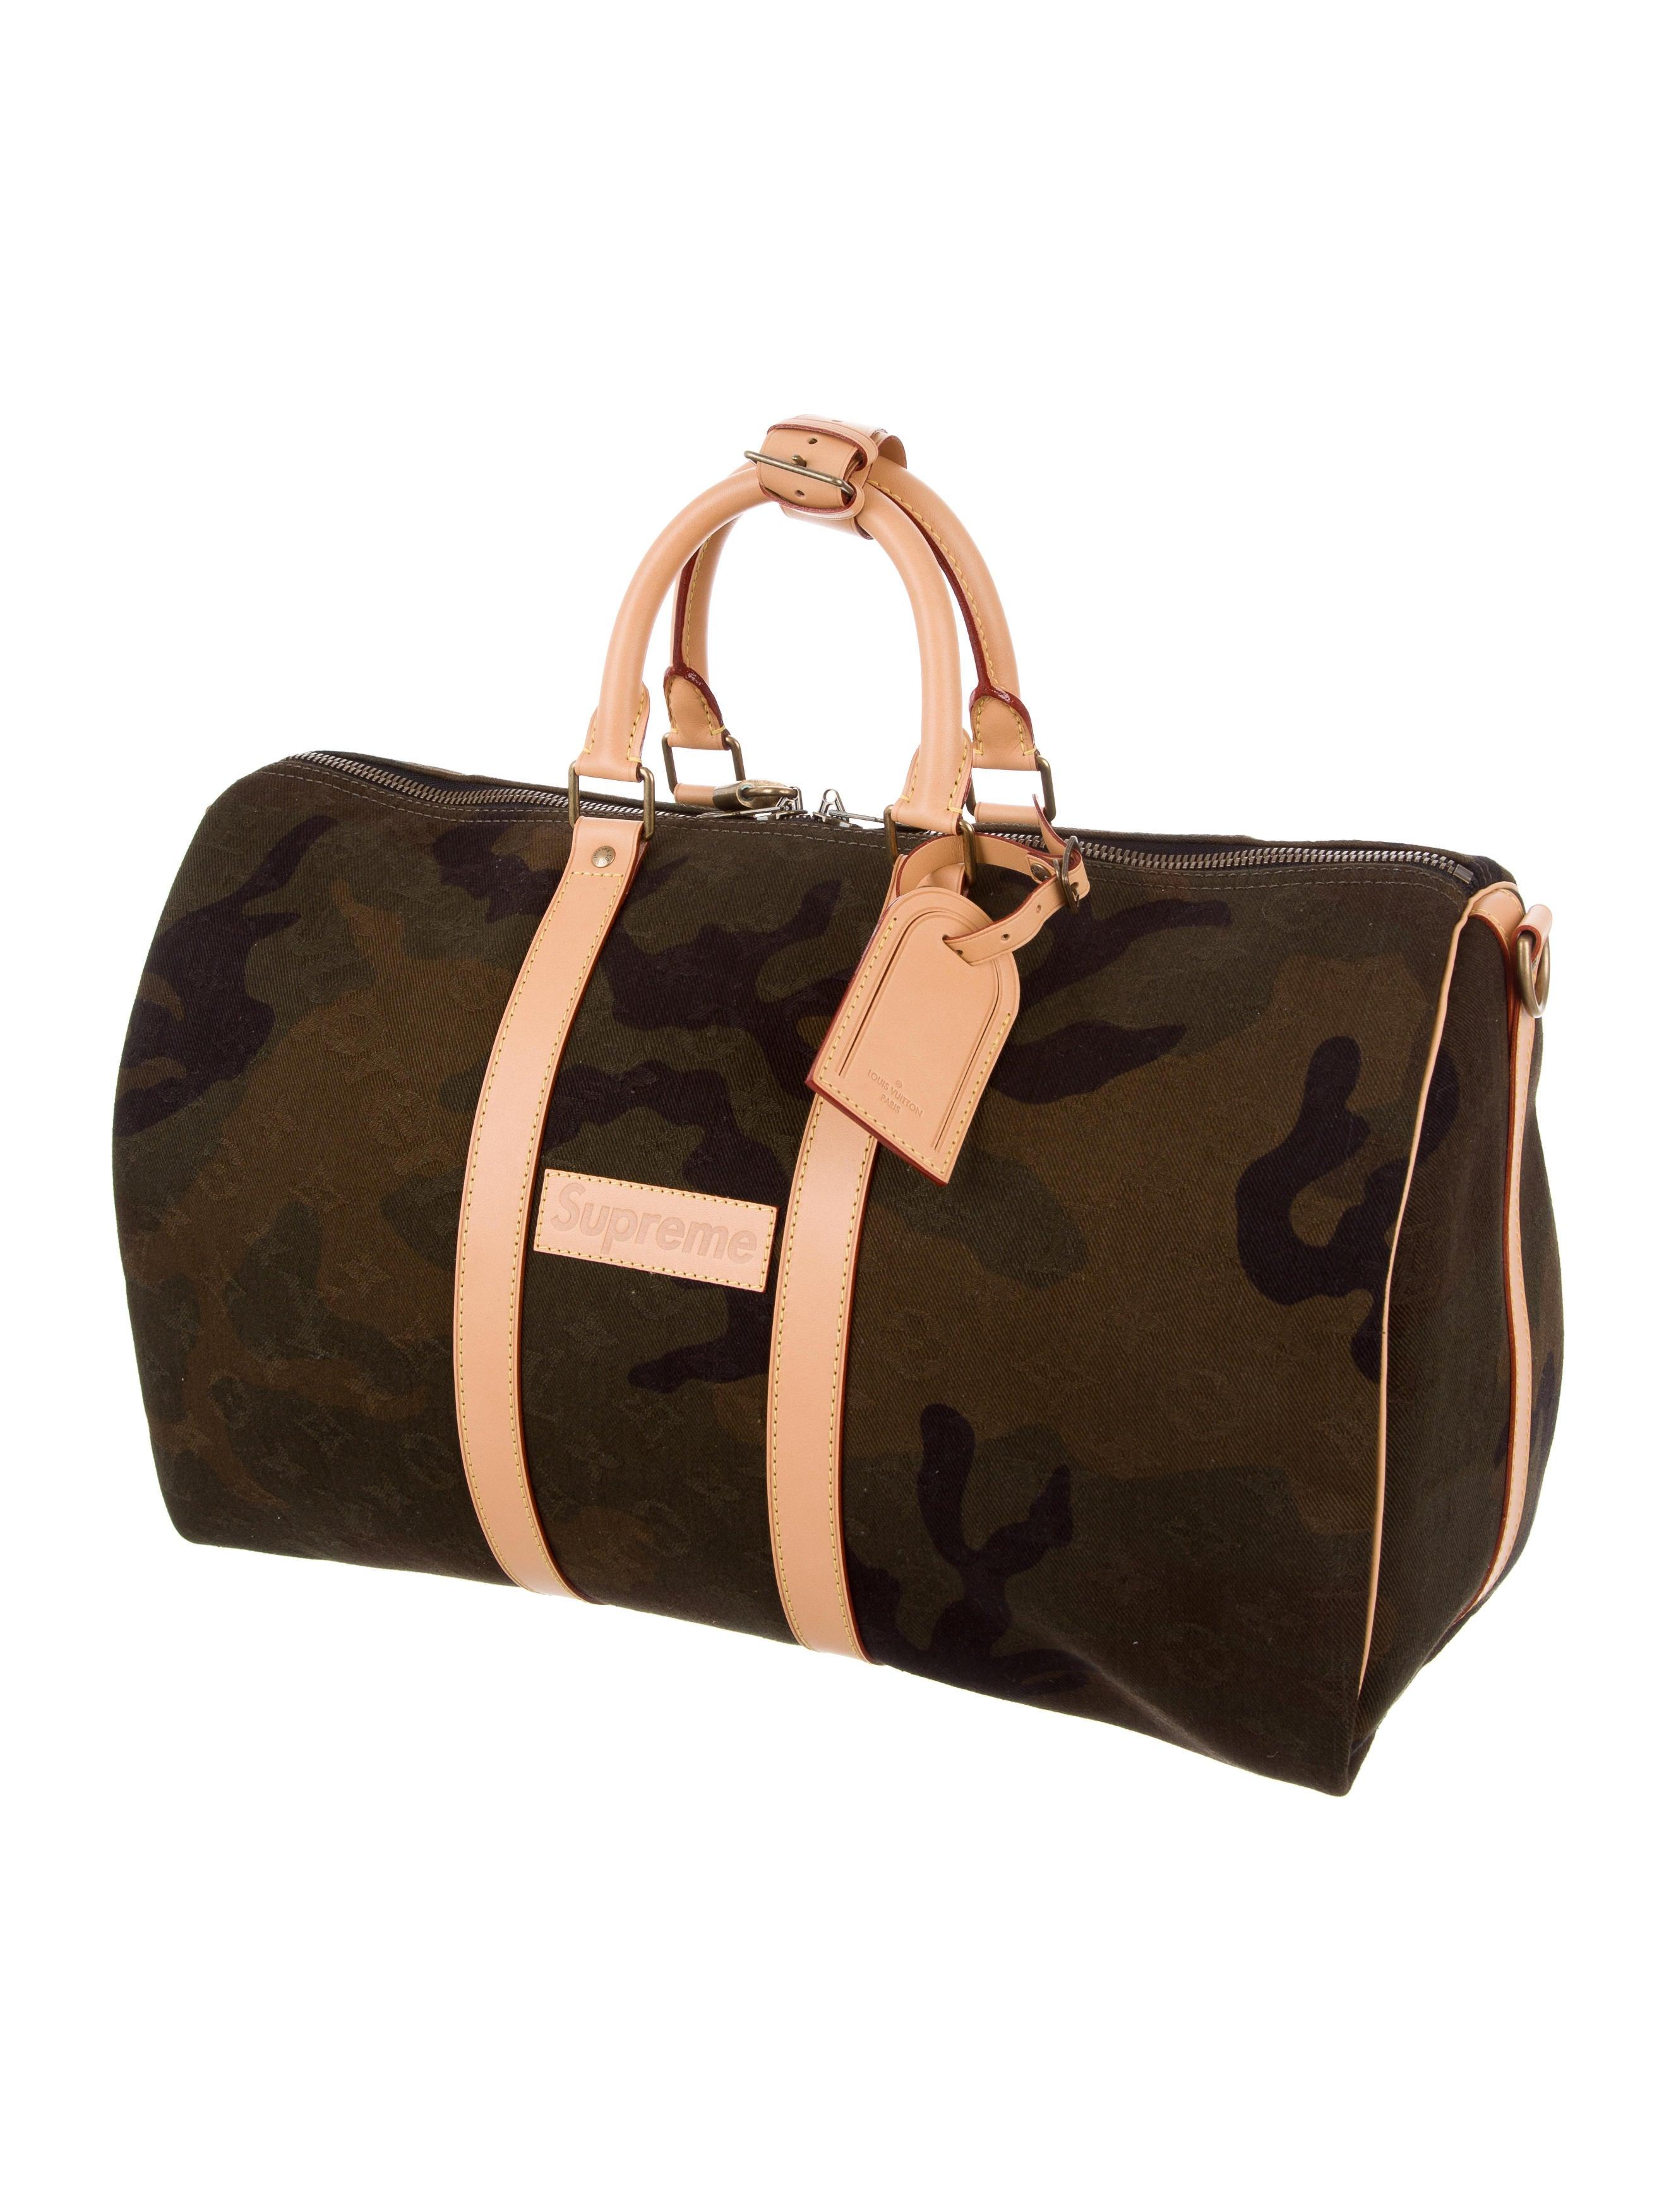 louis vuitton x supreme 2017 monogram camouflage keepall 45 bandouli re bags lousu20038. Black Bedroom Furniture Sets. Home Design Ideas